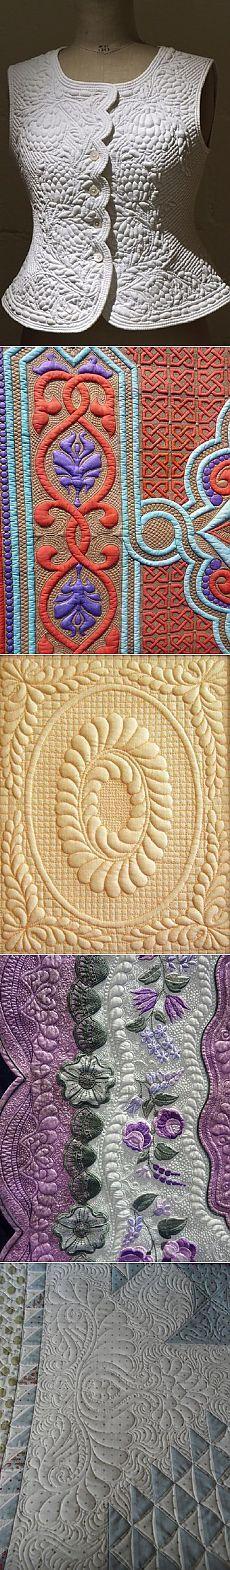 Техника Трапунто (Trapunto) ...объемная вышивка